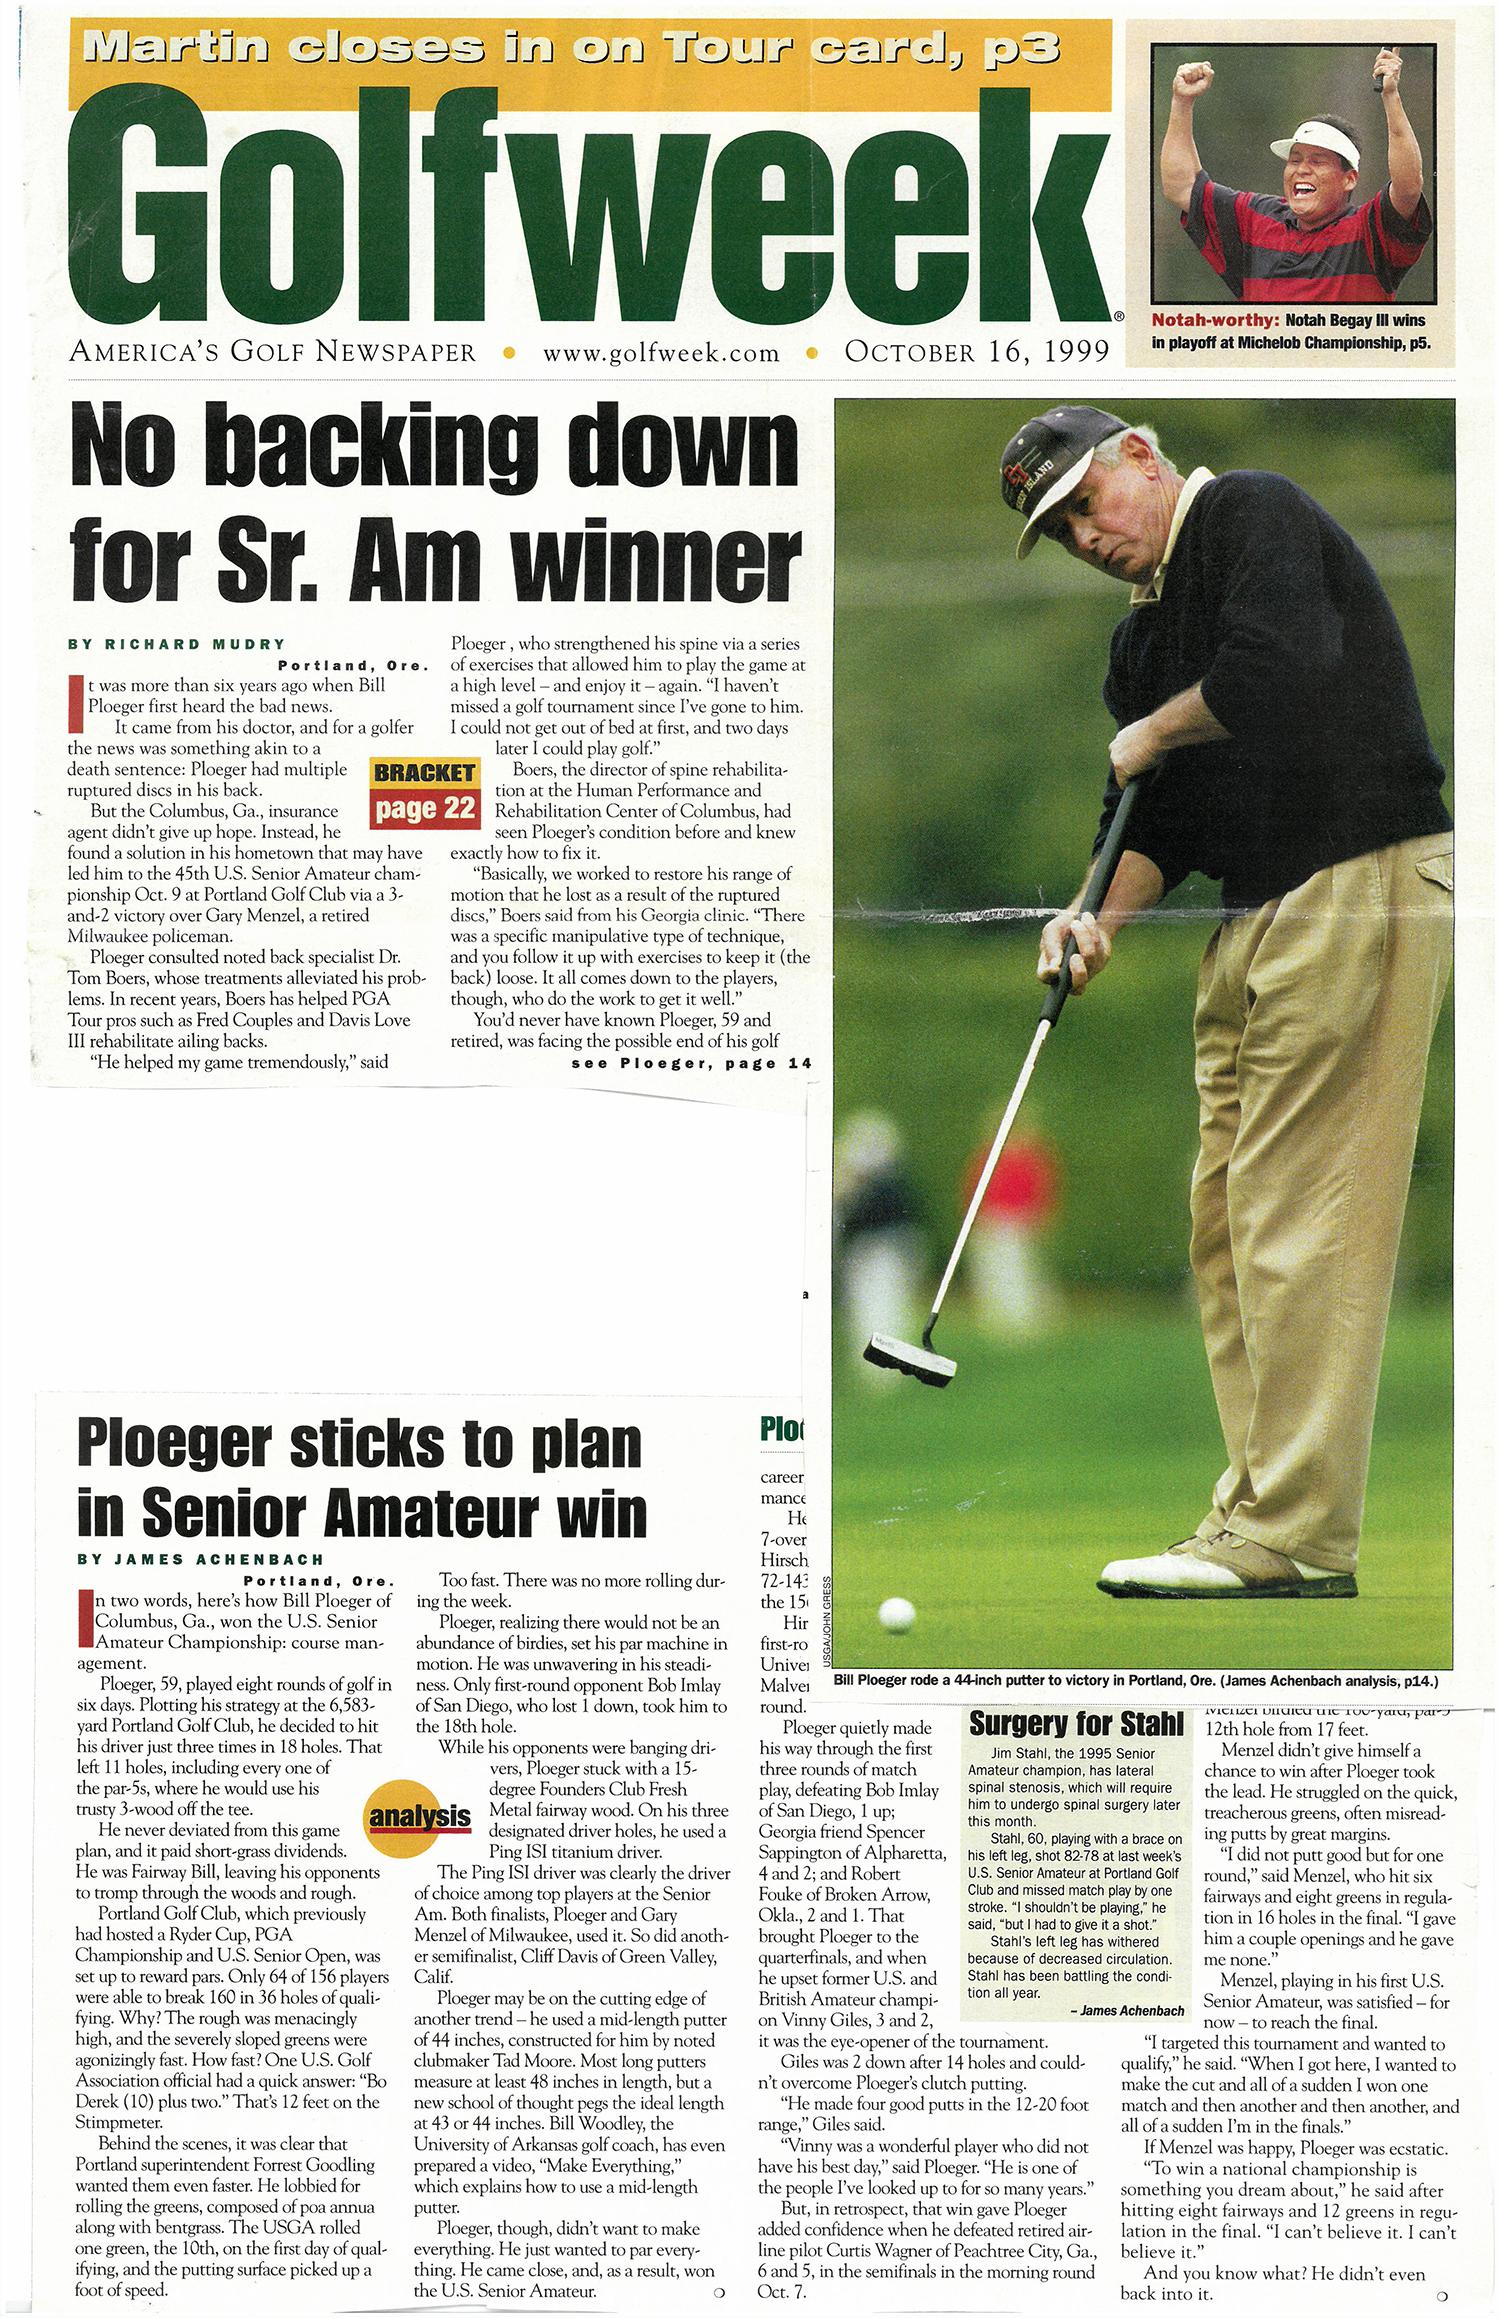 Bill Ploeger - Georgia Tech golf